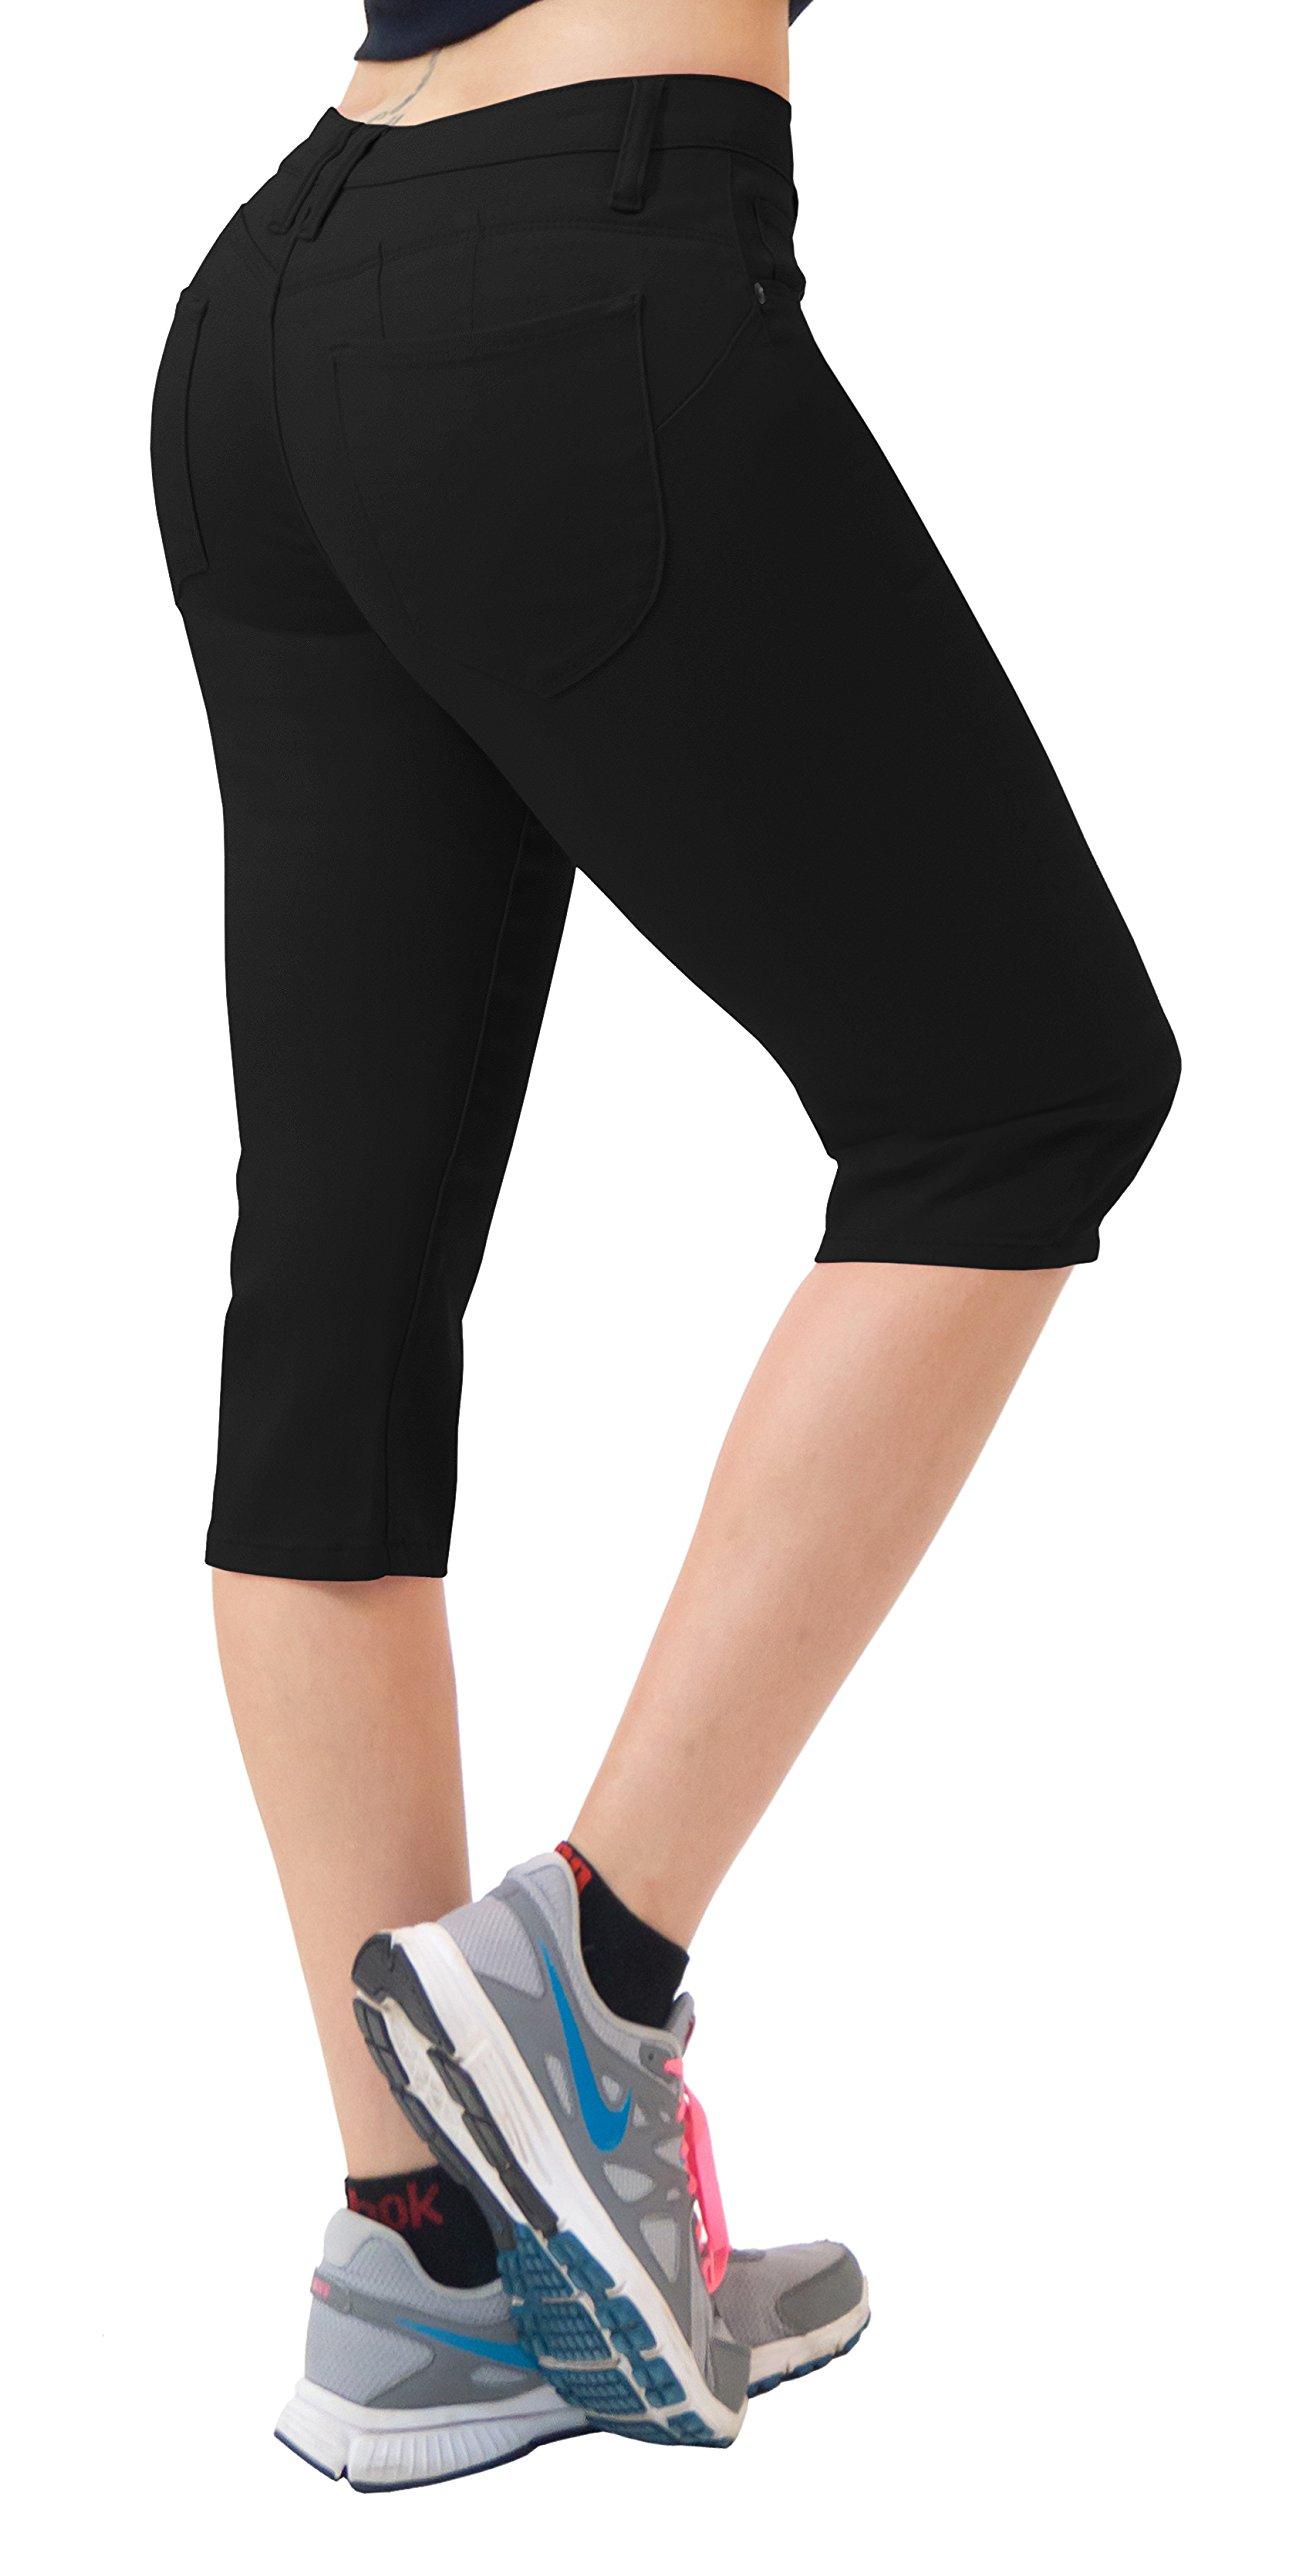 HyBrid & Company Women's Butt Lift Super Comfy Stretch Denim Capri Jeans-Q43300X-BLACK-18